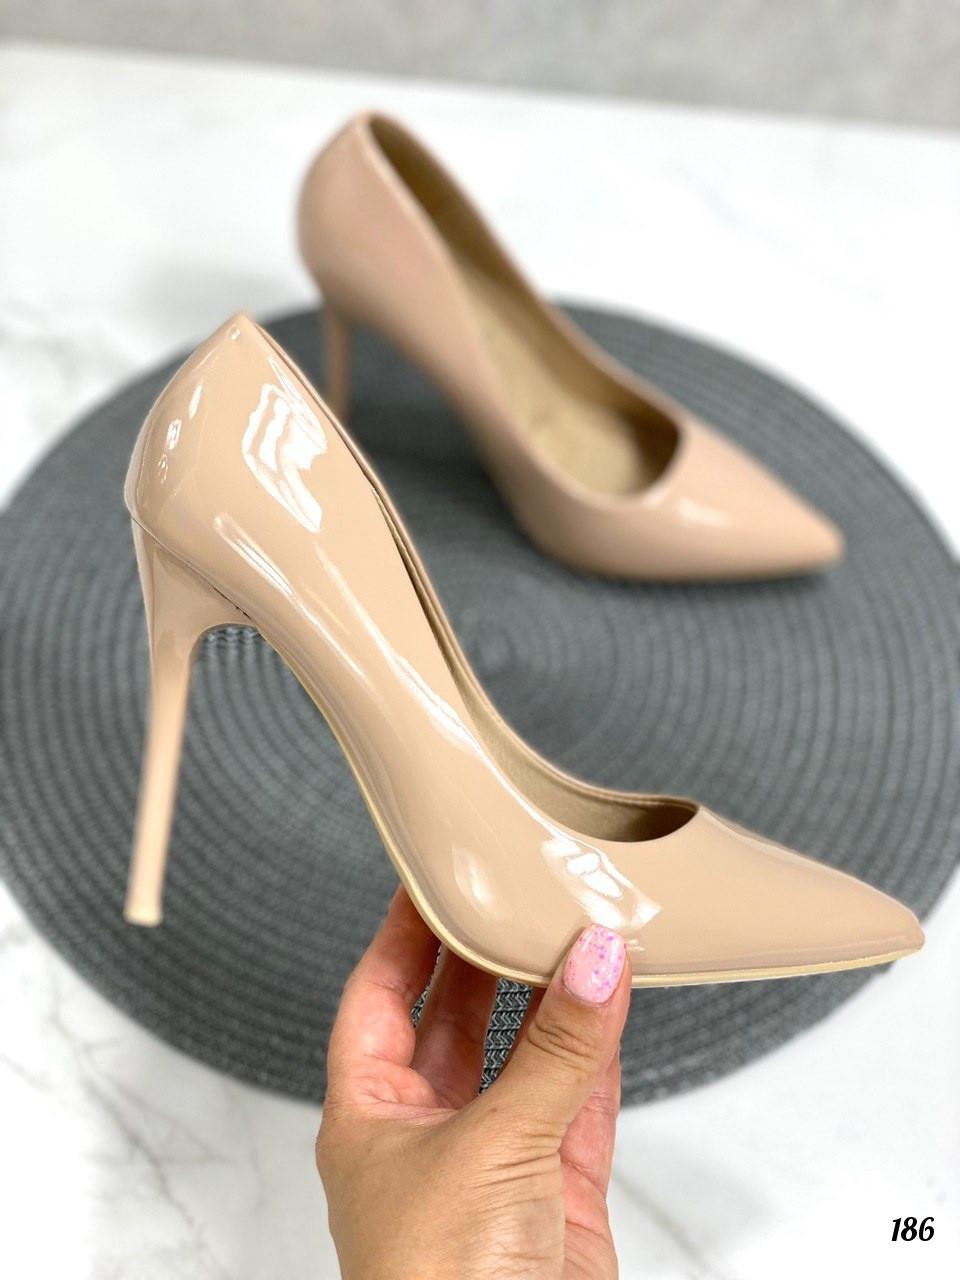 Туфли женские бежево- пудровые эко-лак на каблуке 10 см